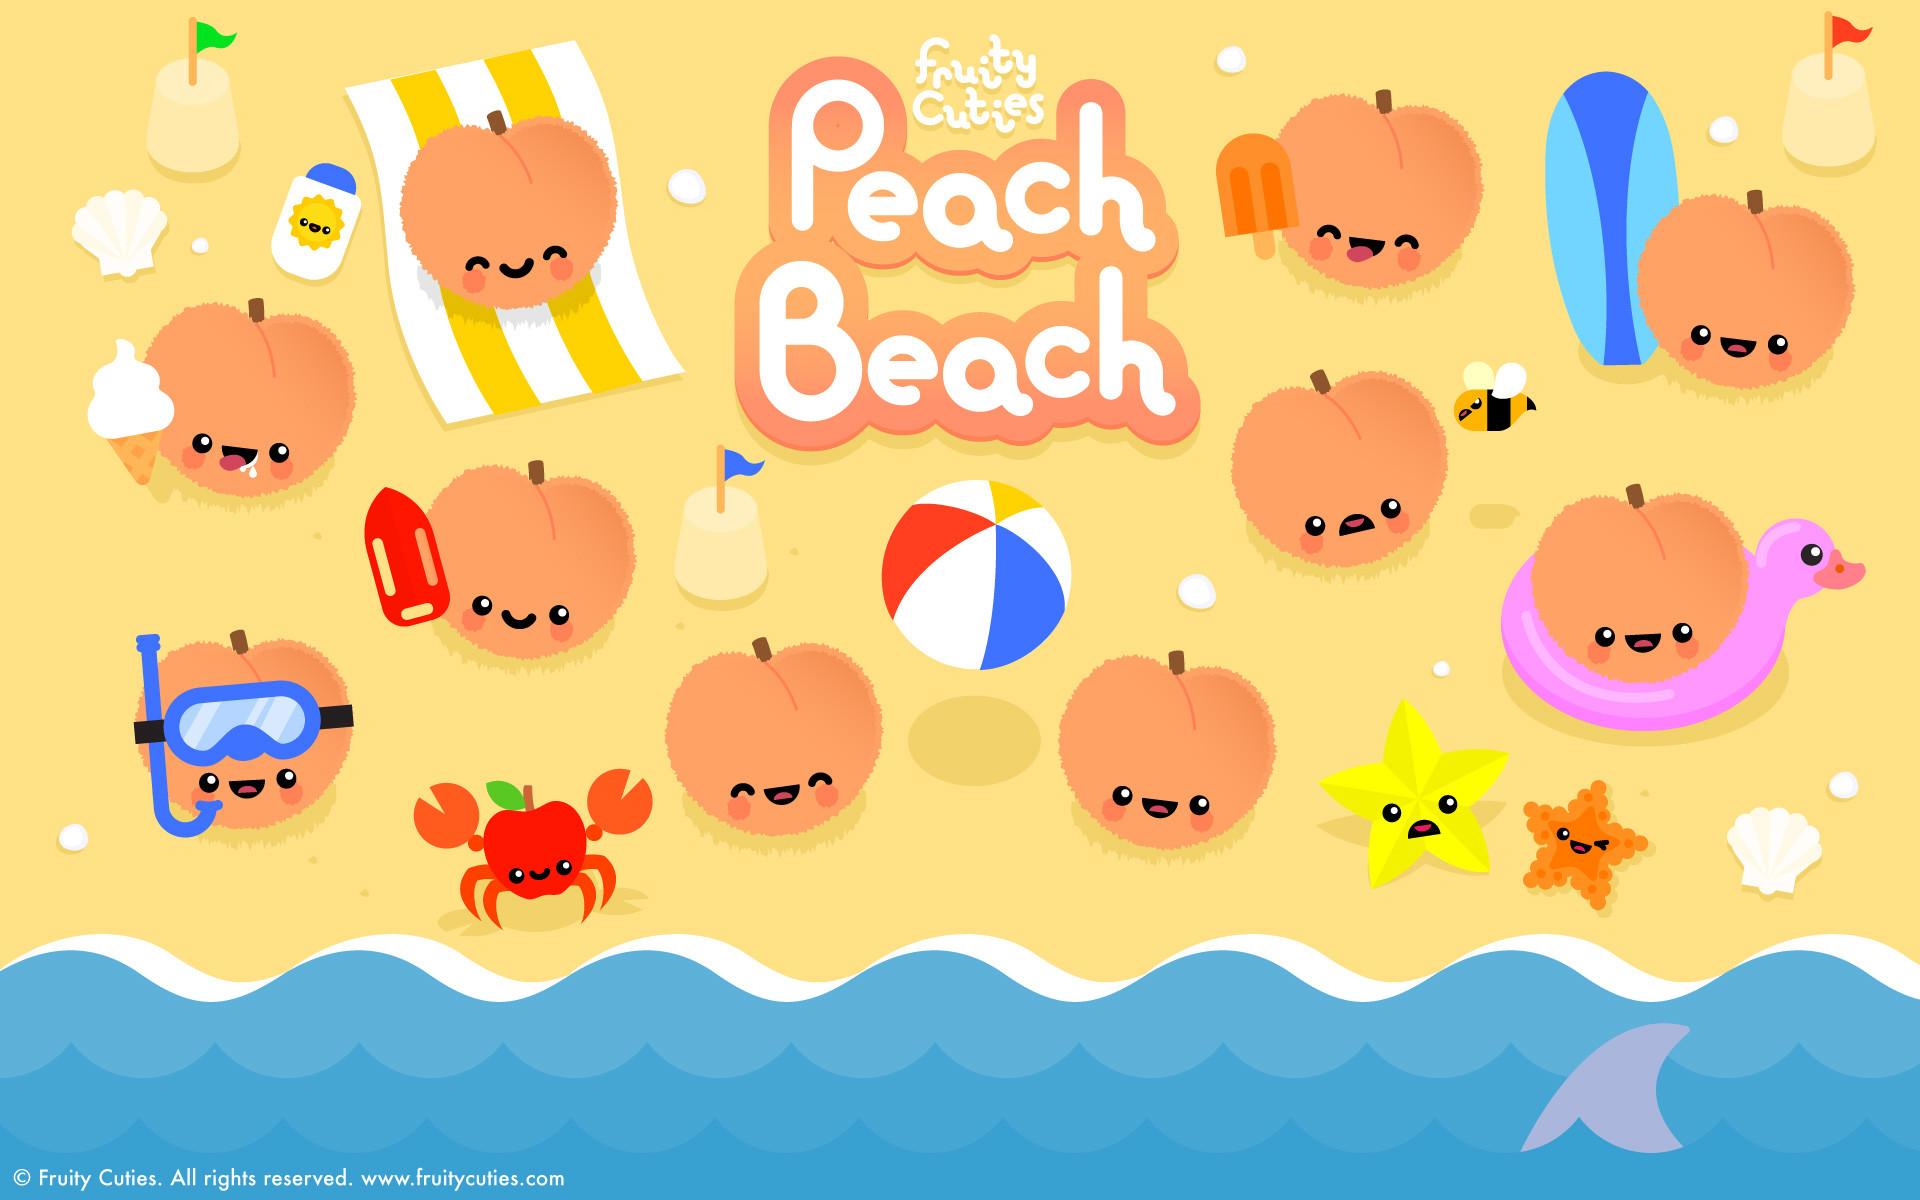 peach-beach-widescreen-wallpaper.jpg (1920×1200)